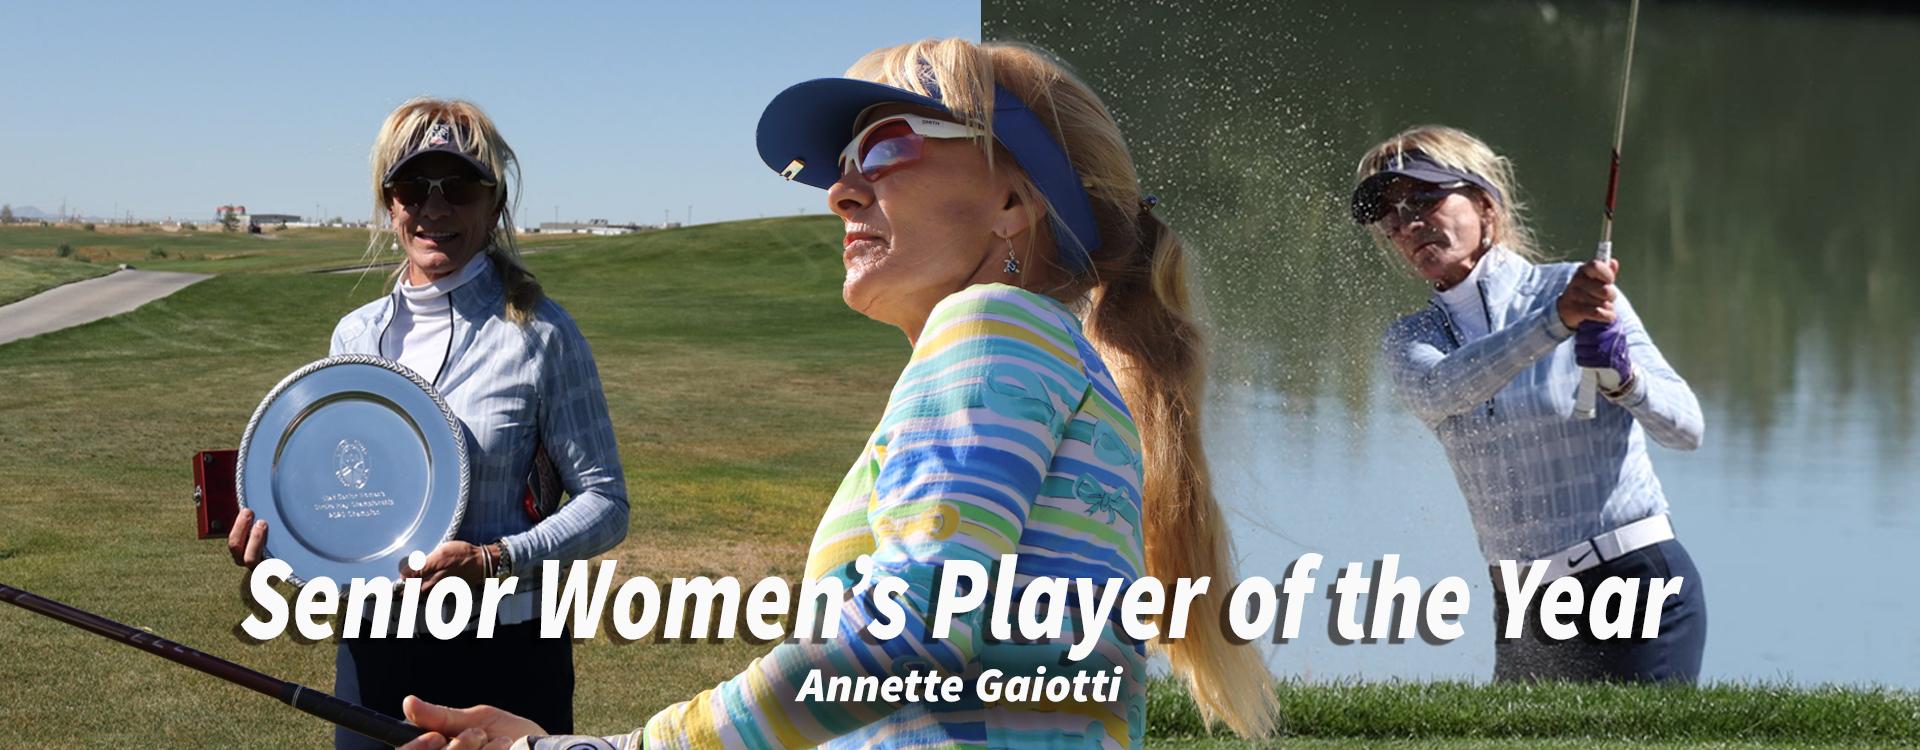 Senior Women's Player of the Year